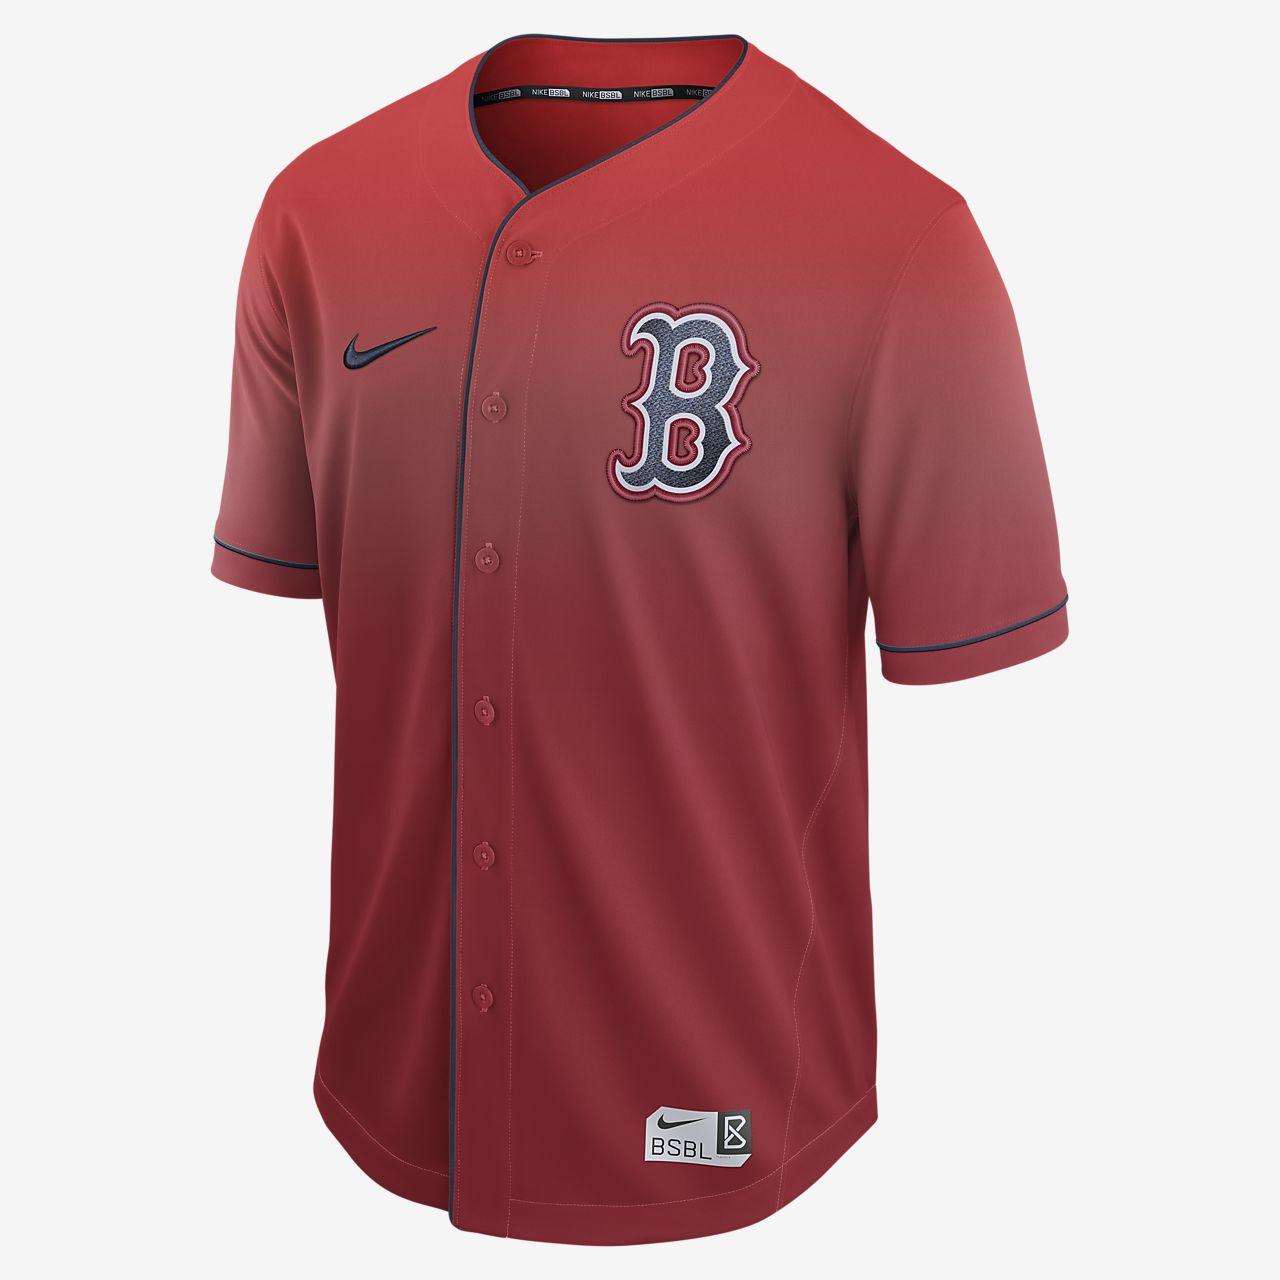 Nike Jersey De Base-ball Air Jordan Red Sox